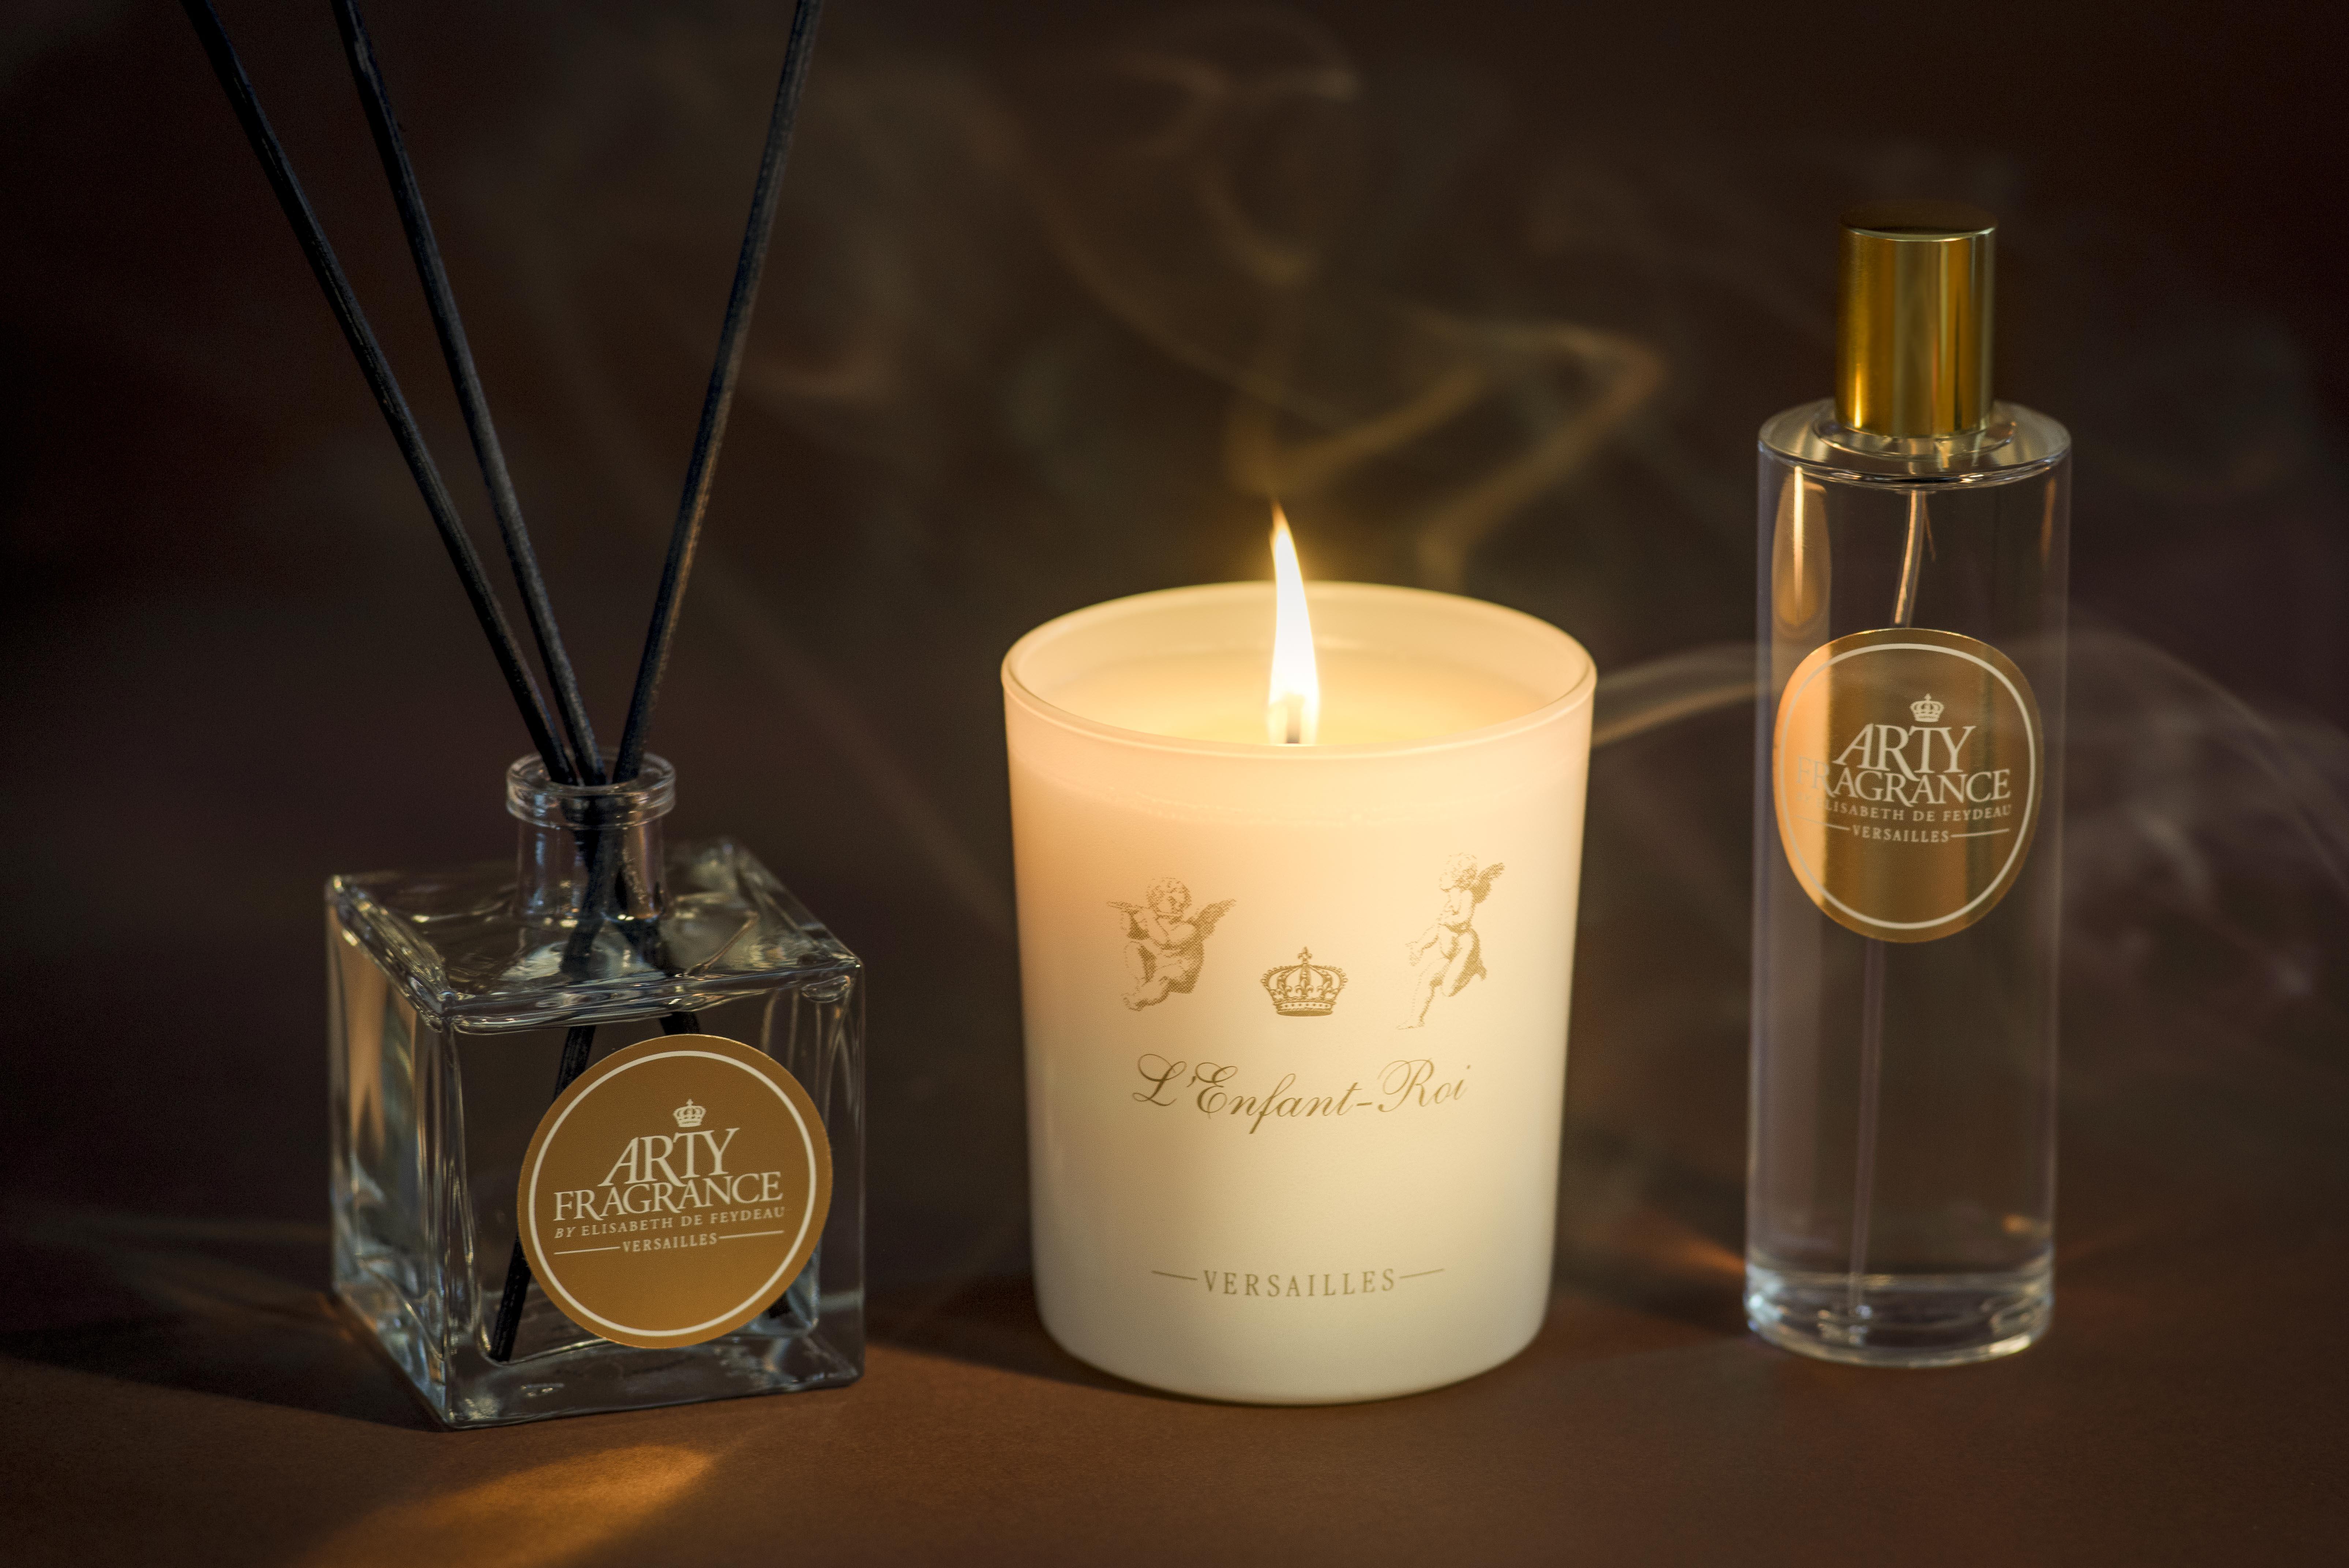 Enfant_Roi-bougies - Atry fragrance